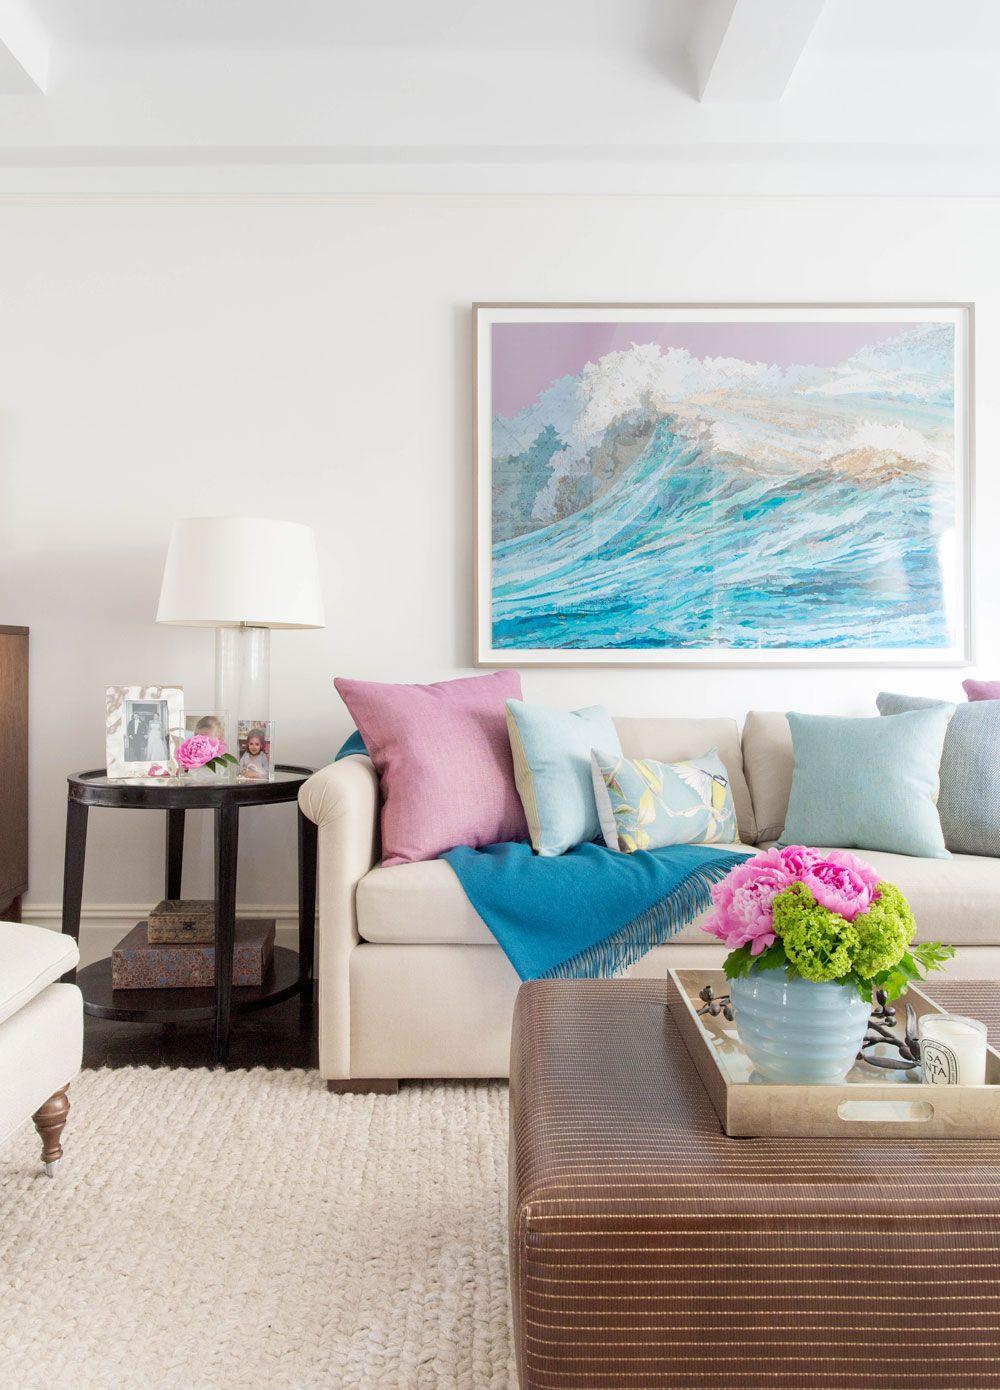 Captivating Caroline Kopp Interior Design | Fairfield County Interior Design | Welcome